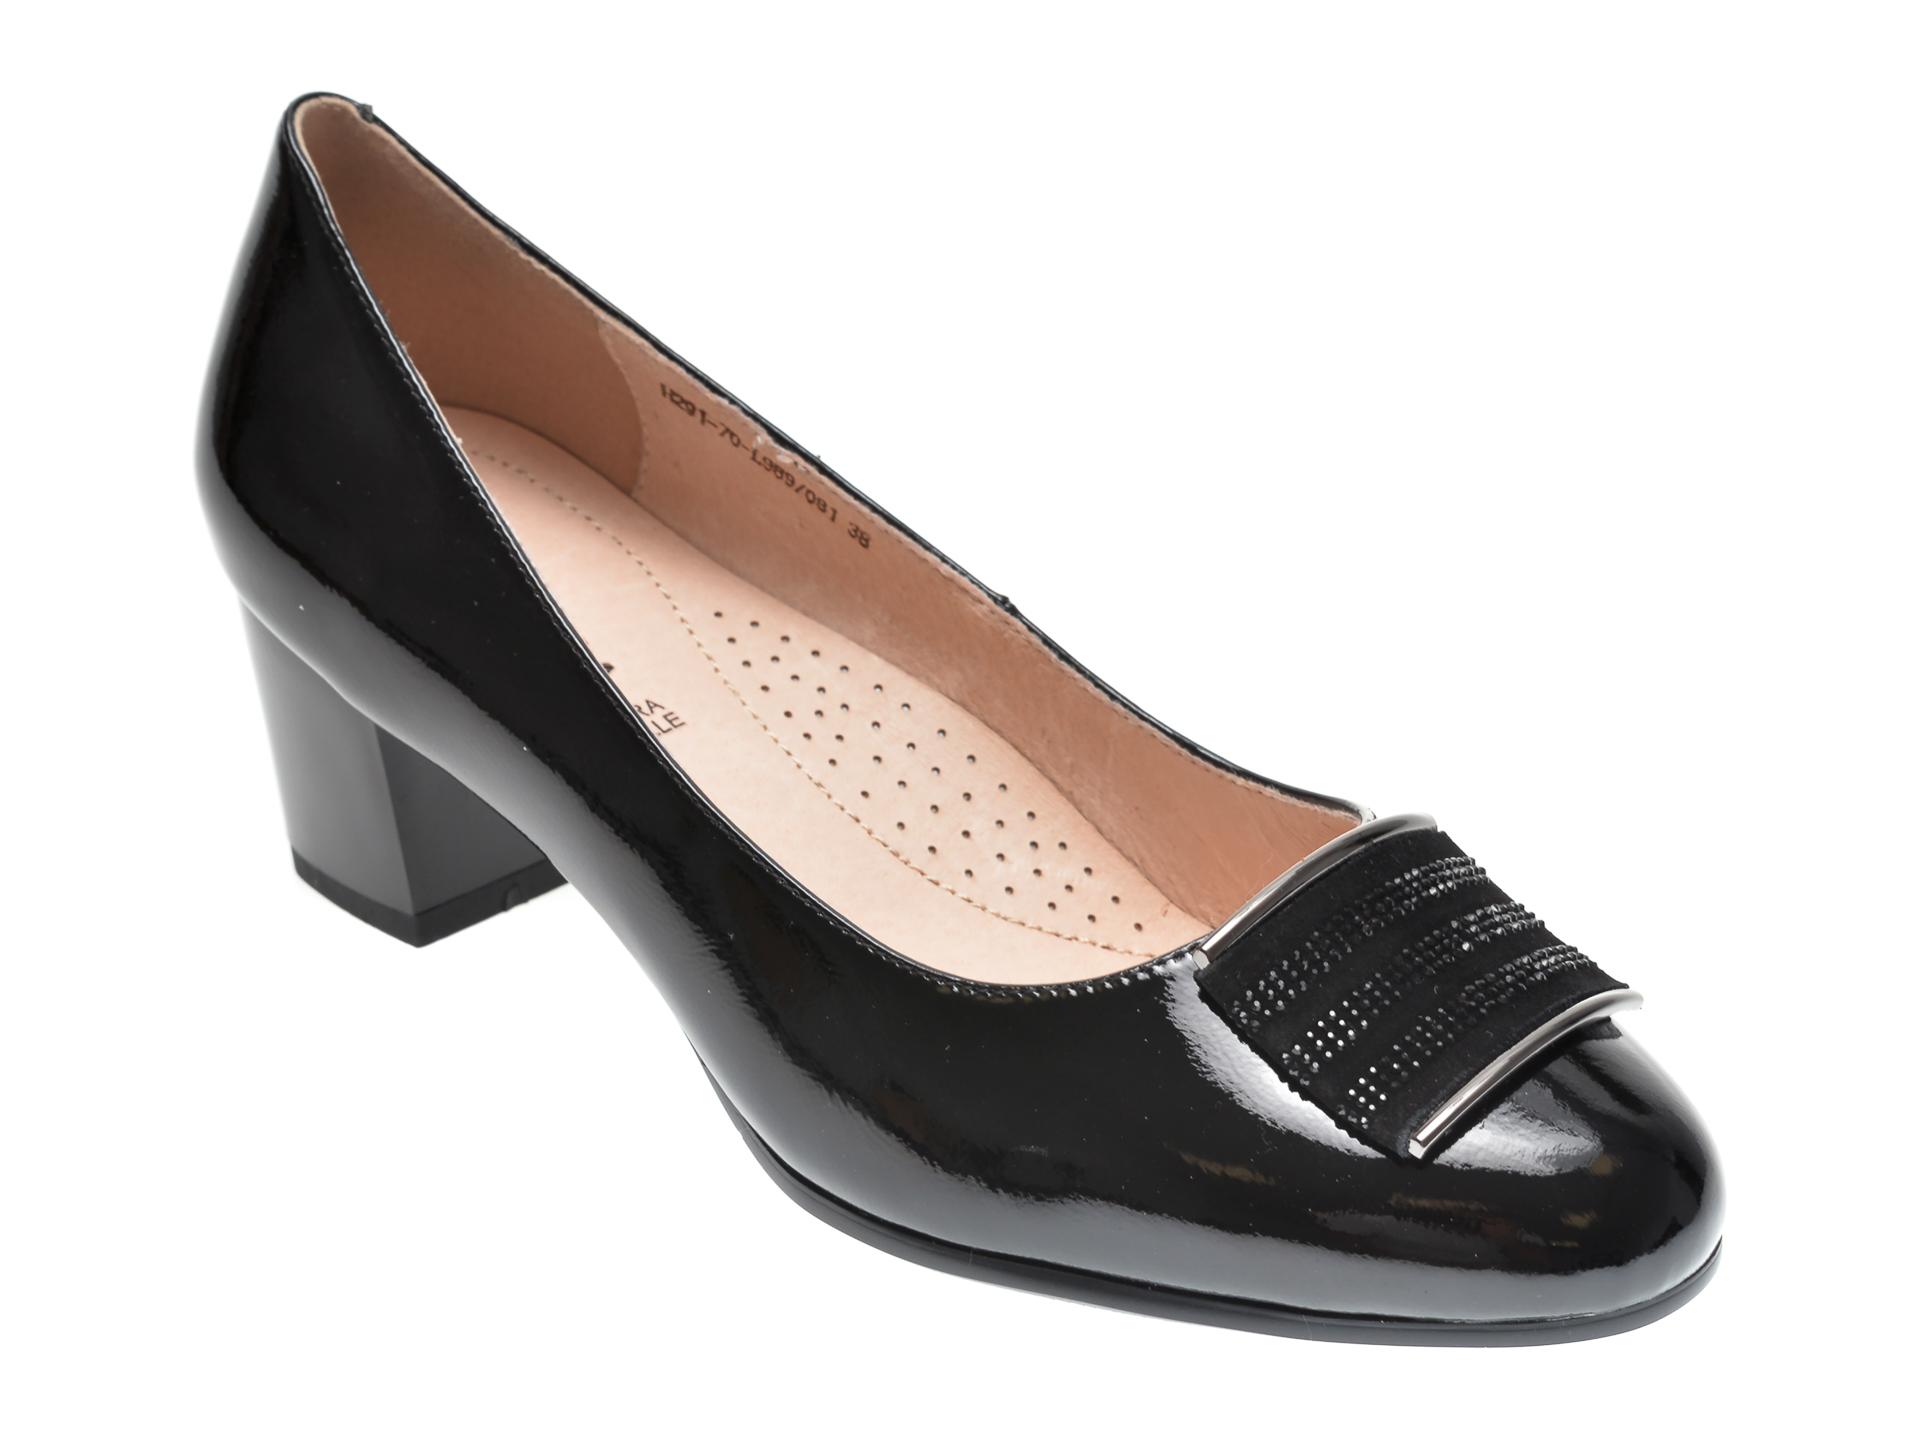 Pantofi KARISMA negri, H29170, din piele naturala lacuita imagine